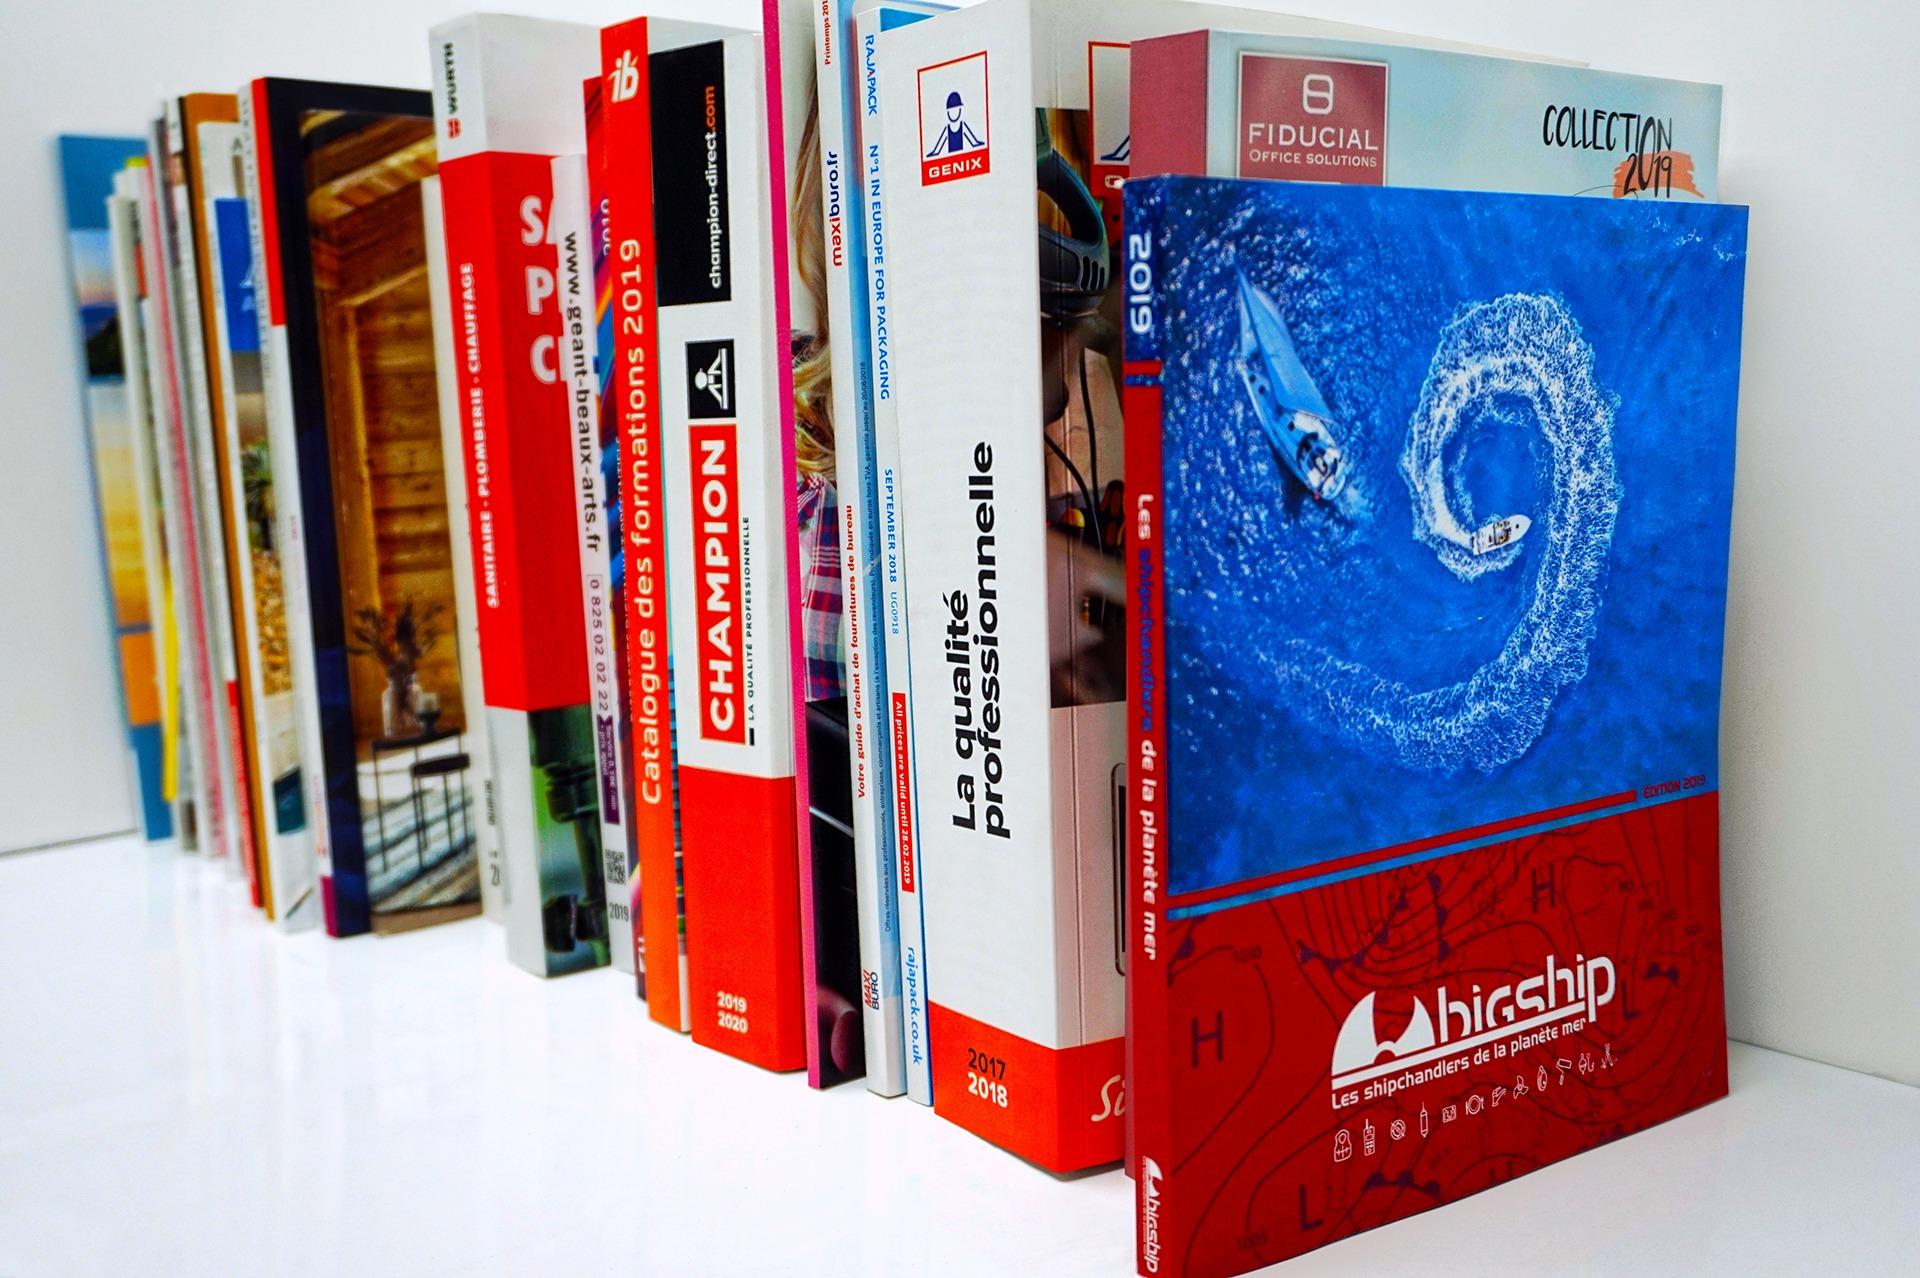 Les différents formats de catalogues d'AGIR GRAPHIC